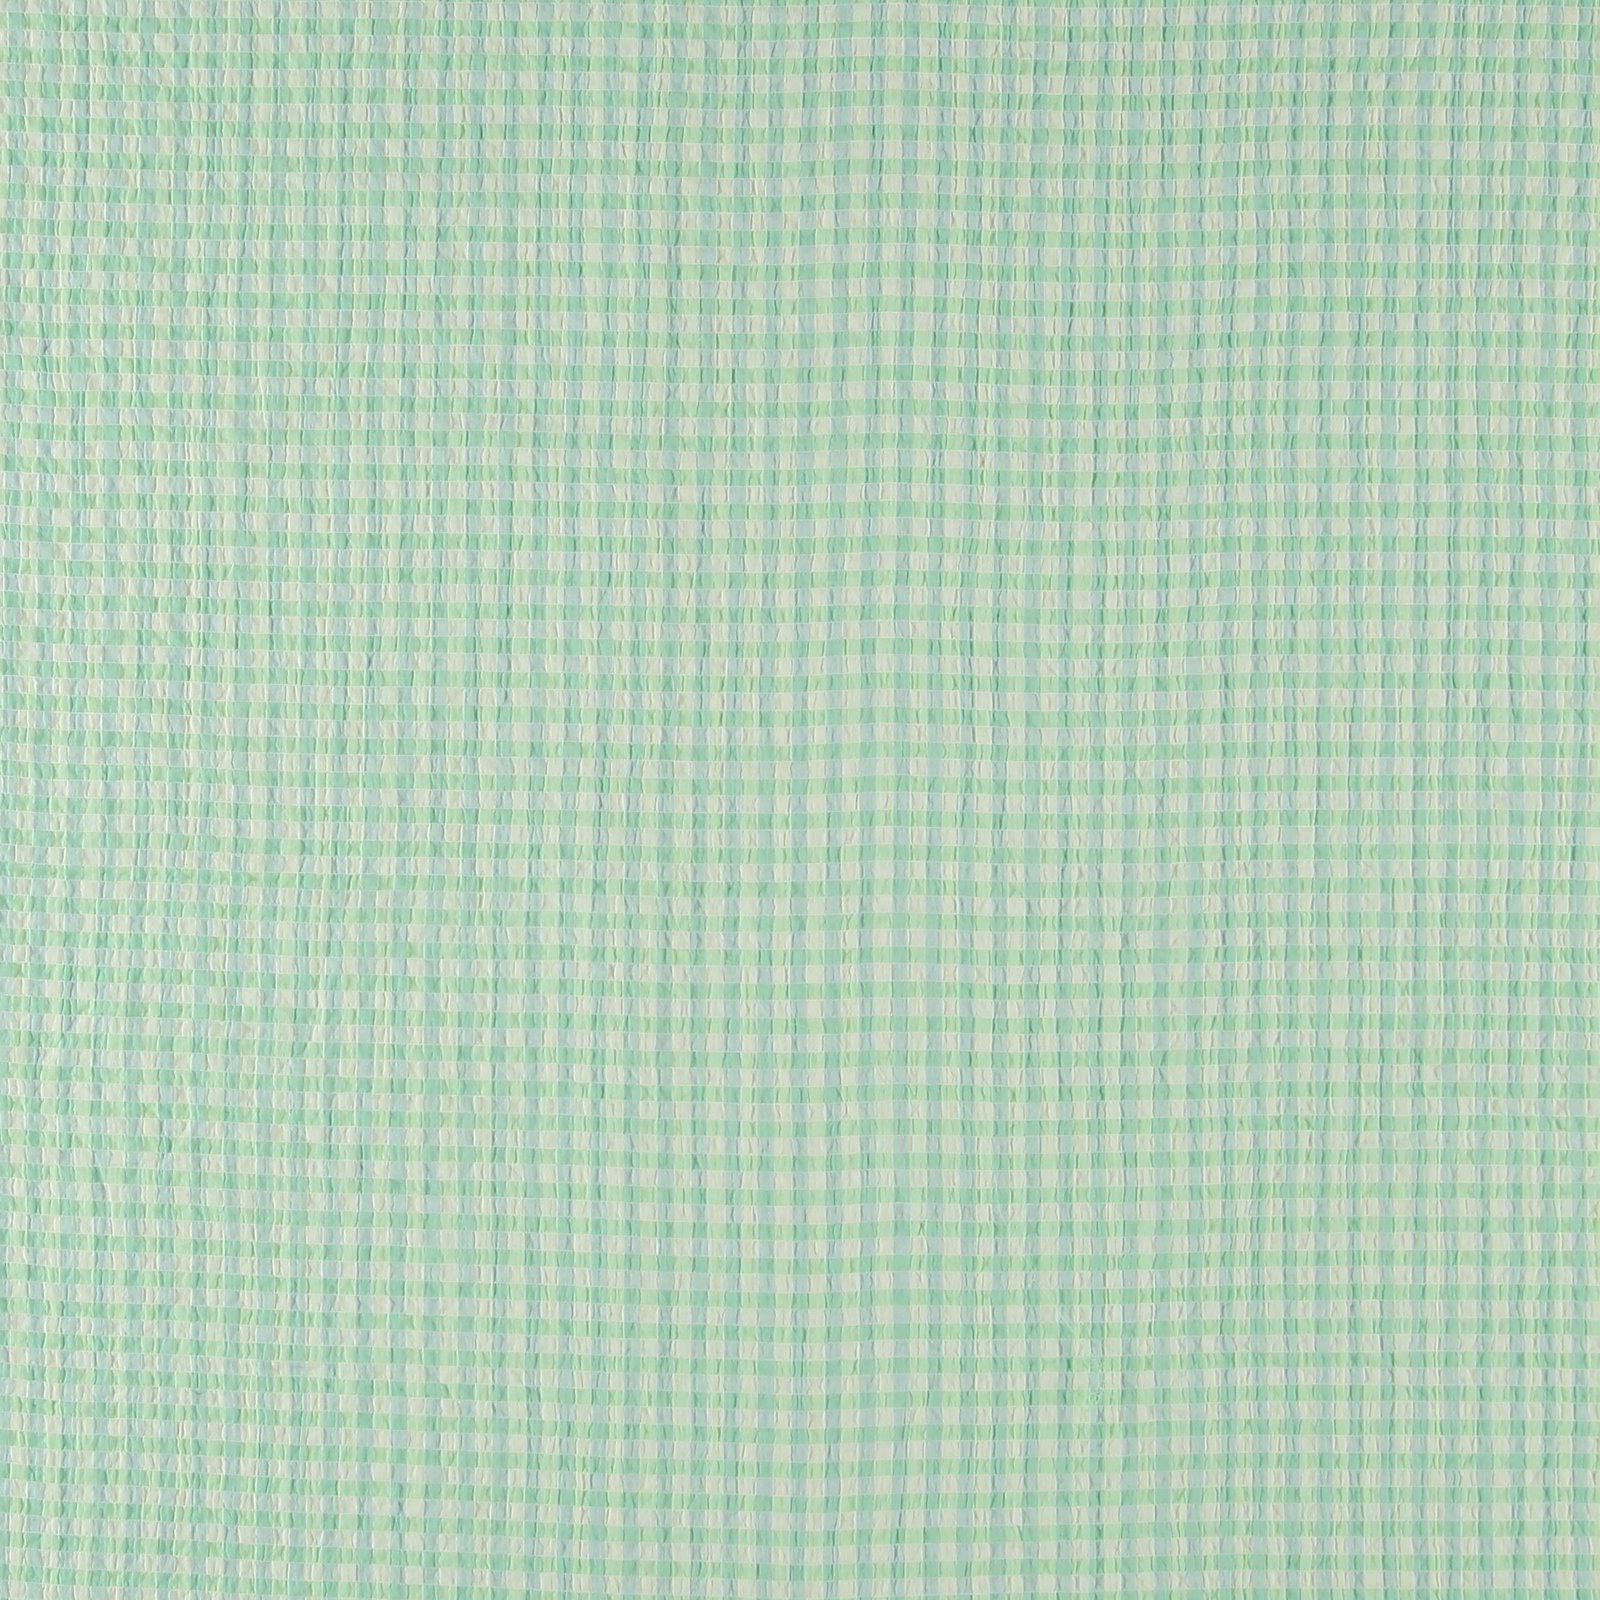 Seersucker mint/lightblue YD check 580040_pack_sp